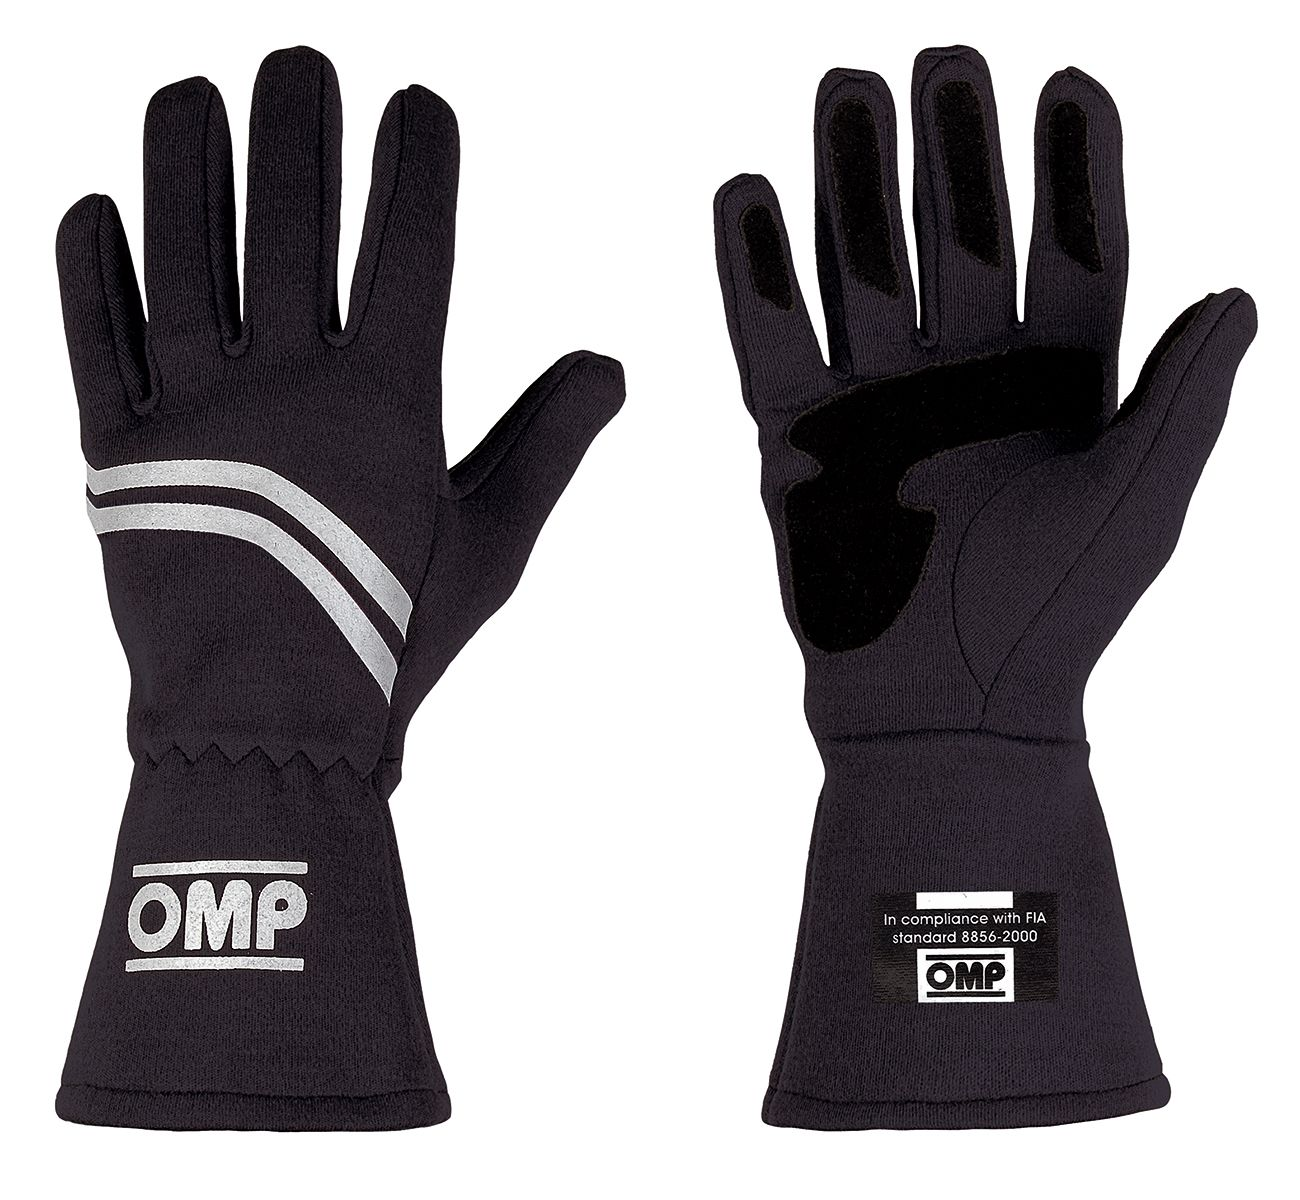 Omp Dijon Race Gloves Jet Black Gloves Racing Racing Gear